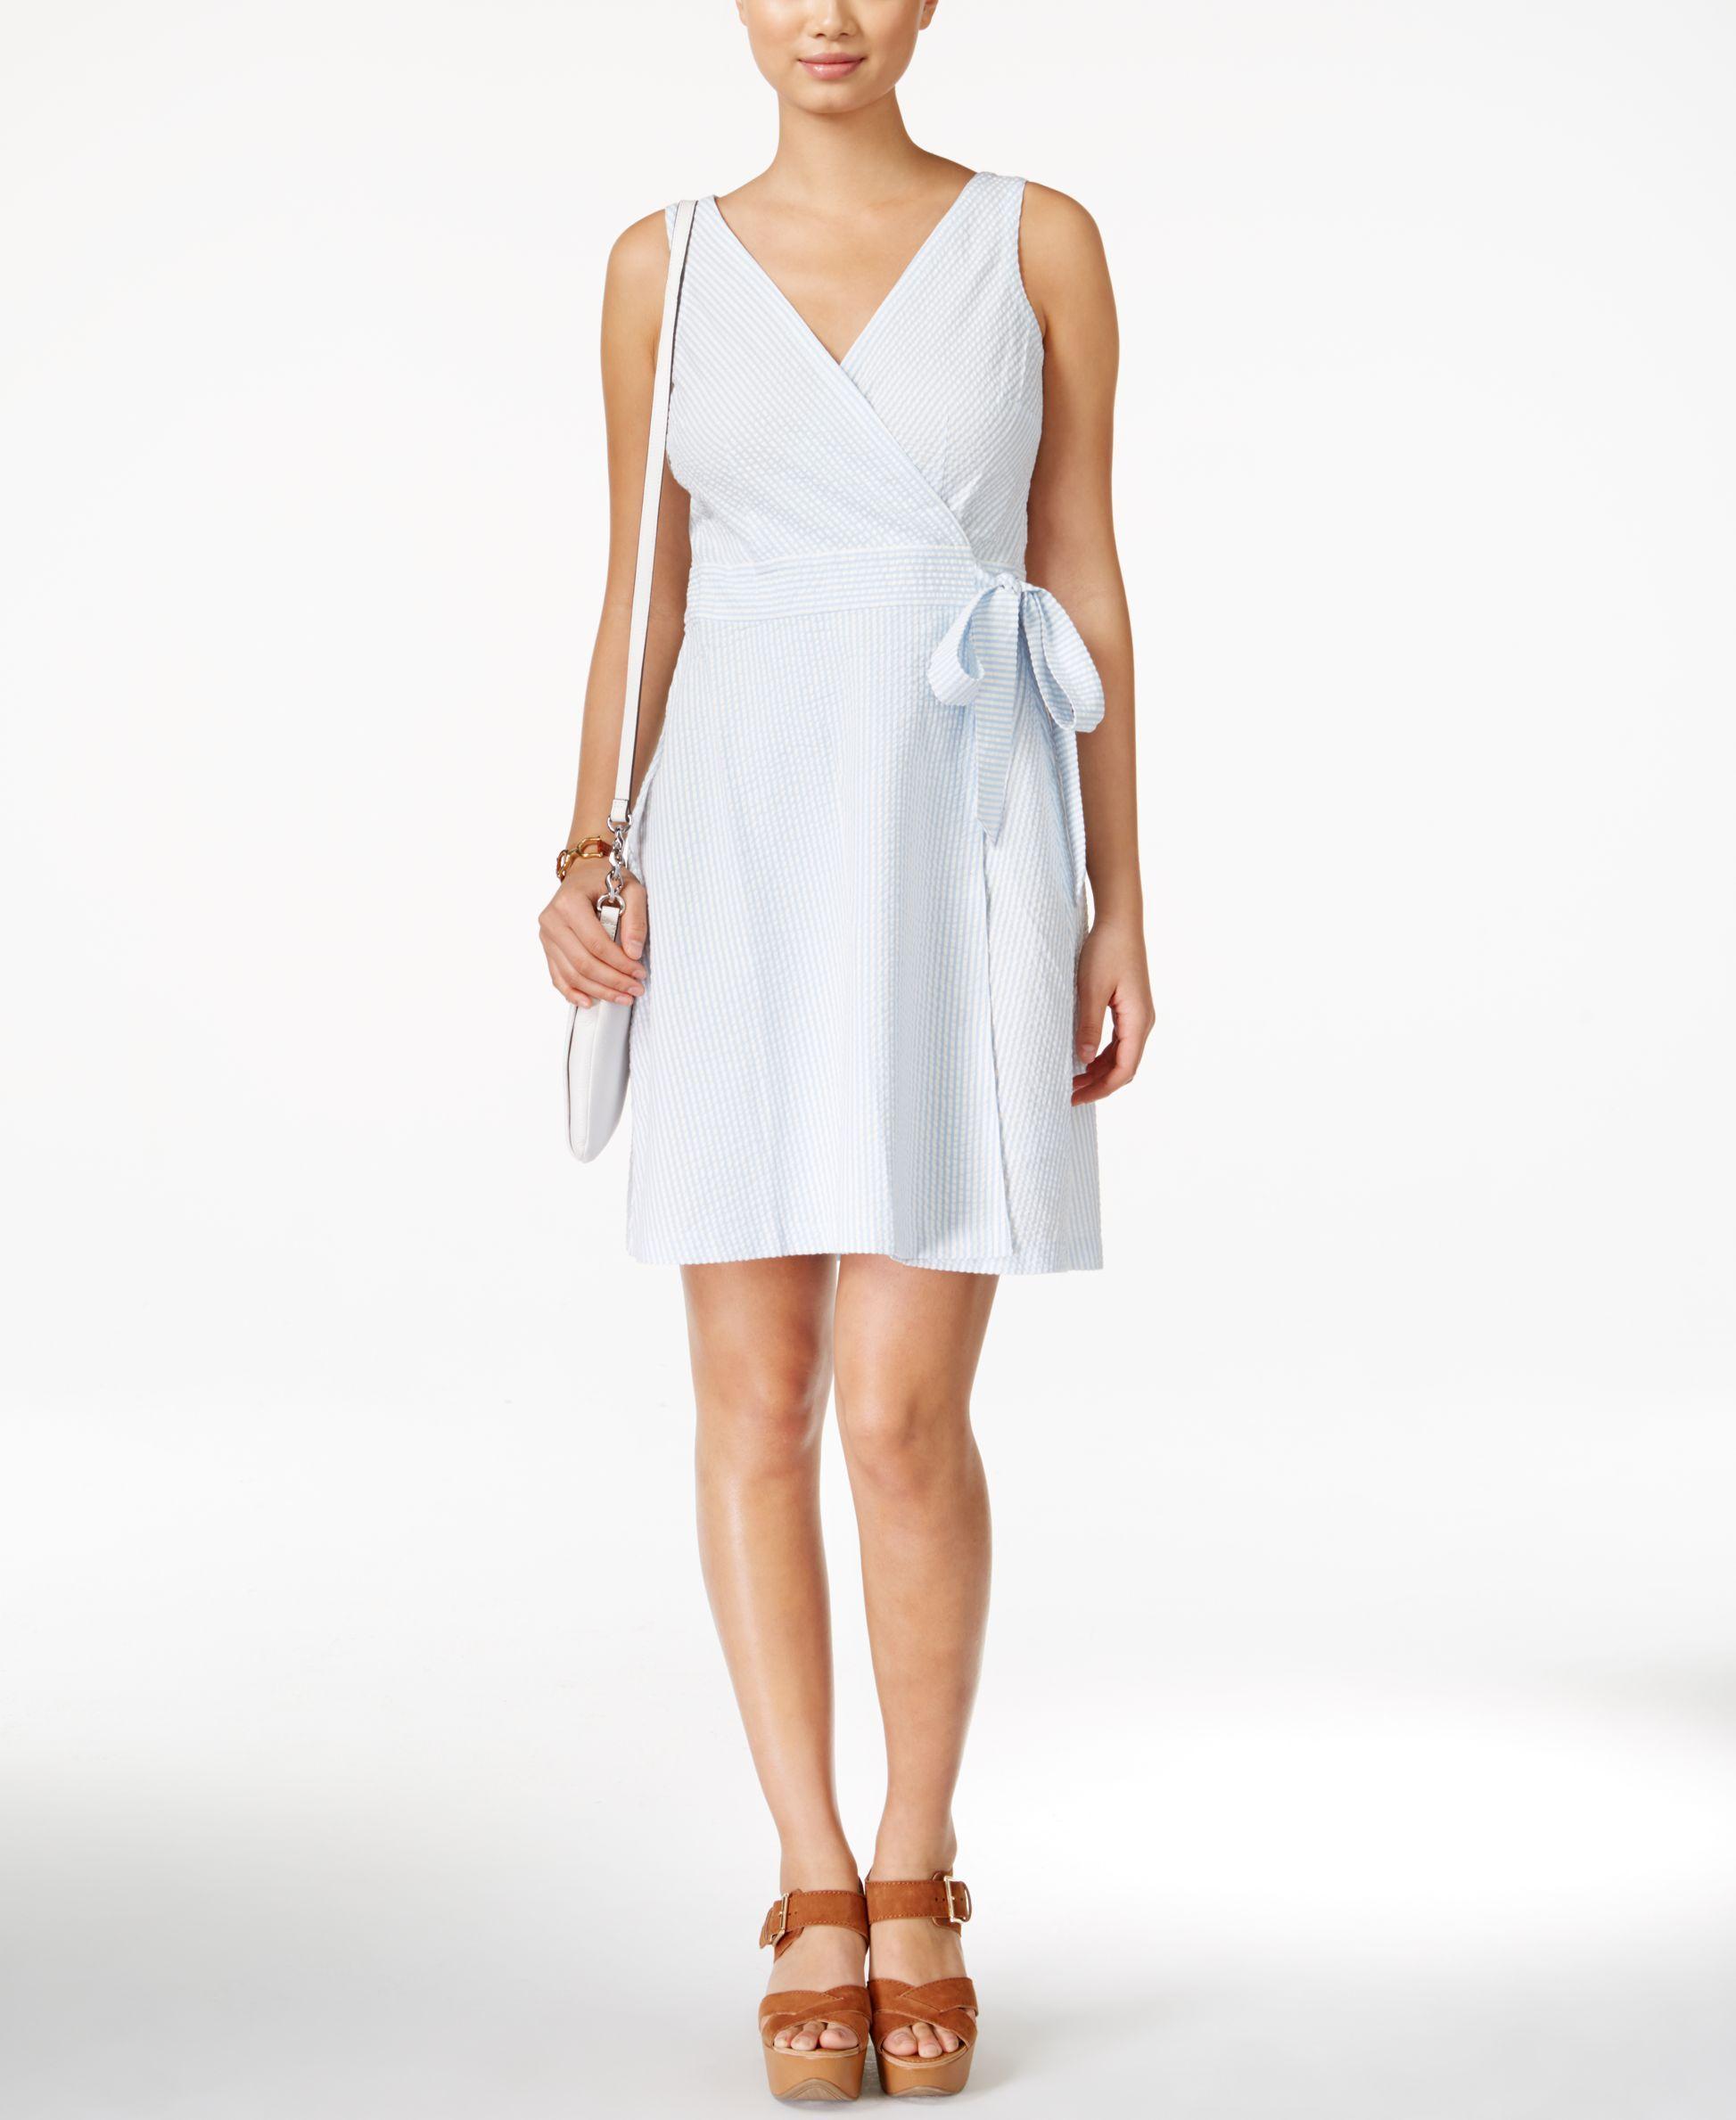 Tommy Hilfiger Seersucker Wrap Dress Dresses Wrap Dress